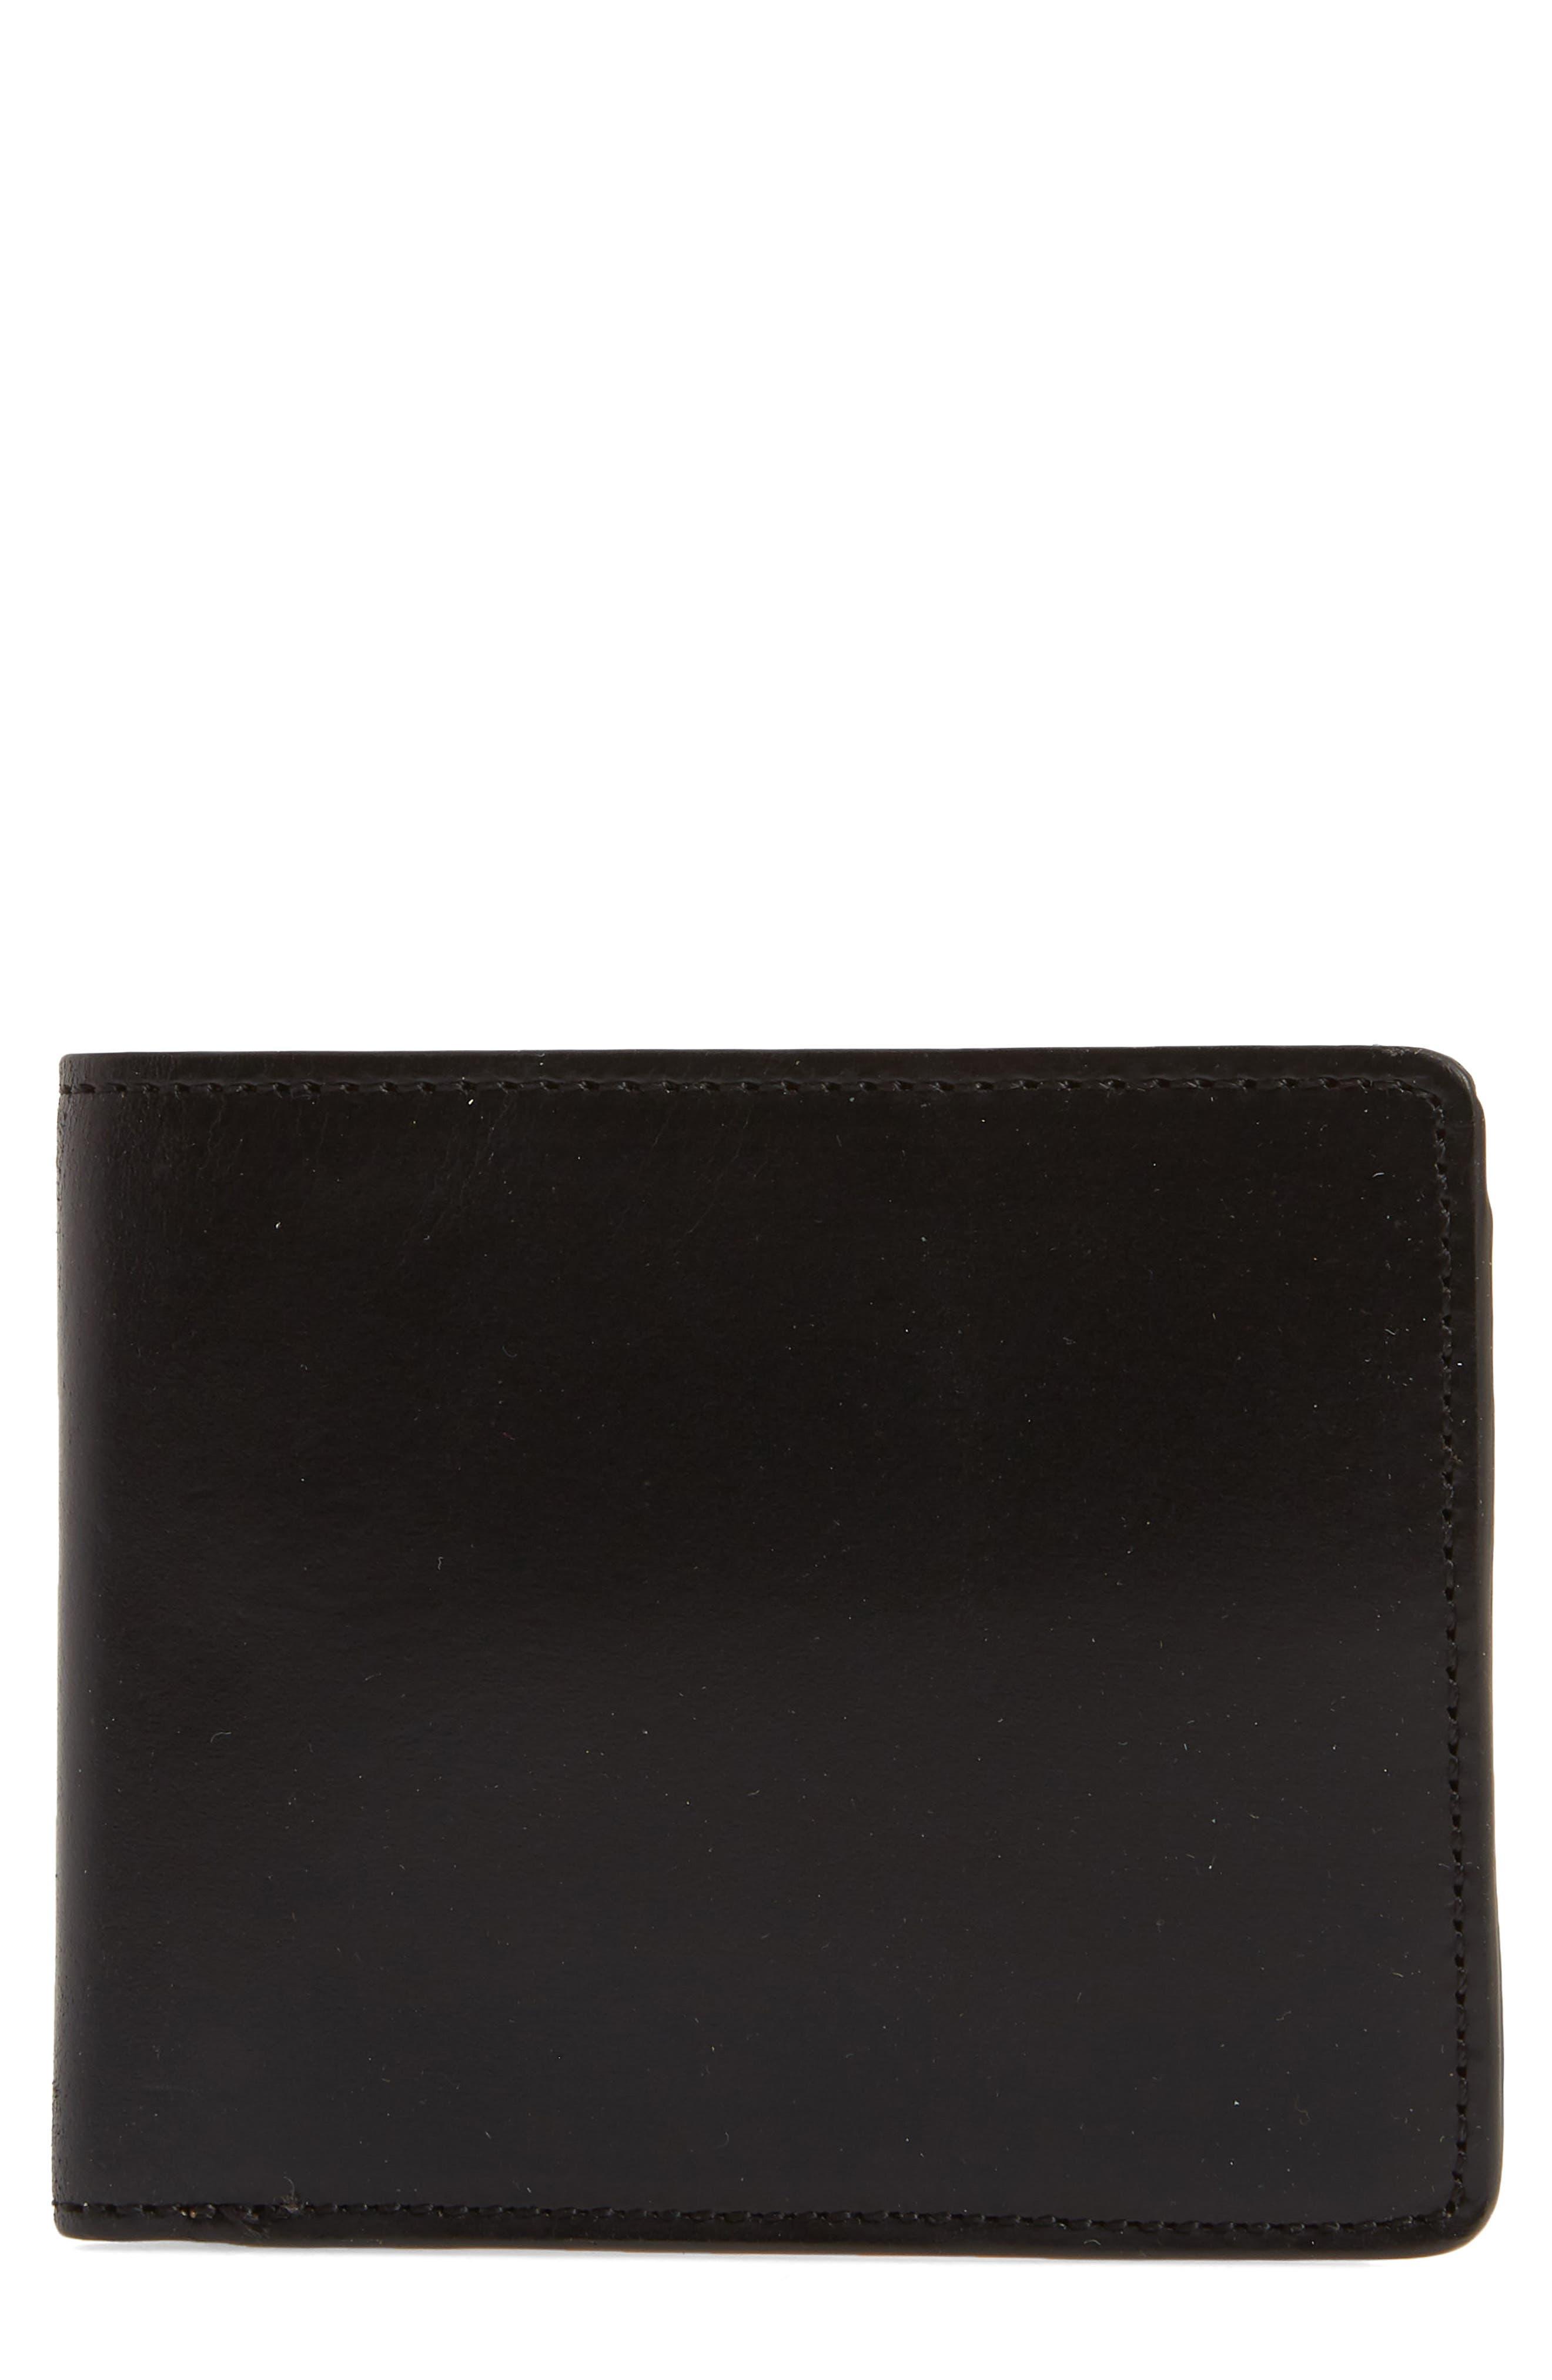 Darien Leather Wallet,                         Main,                         color, 001